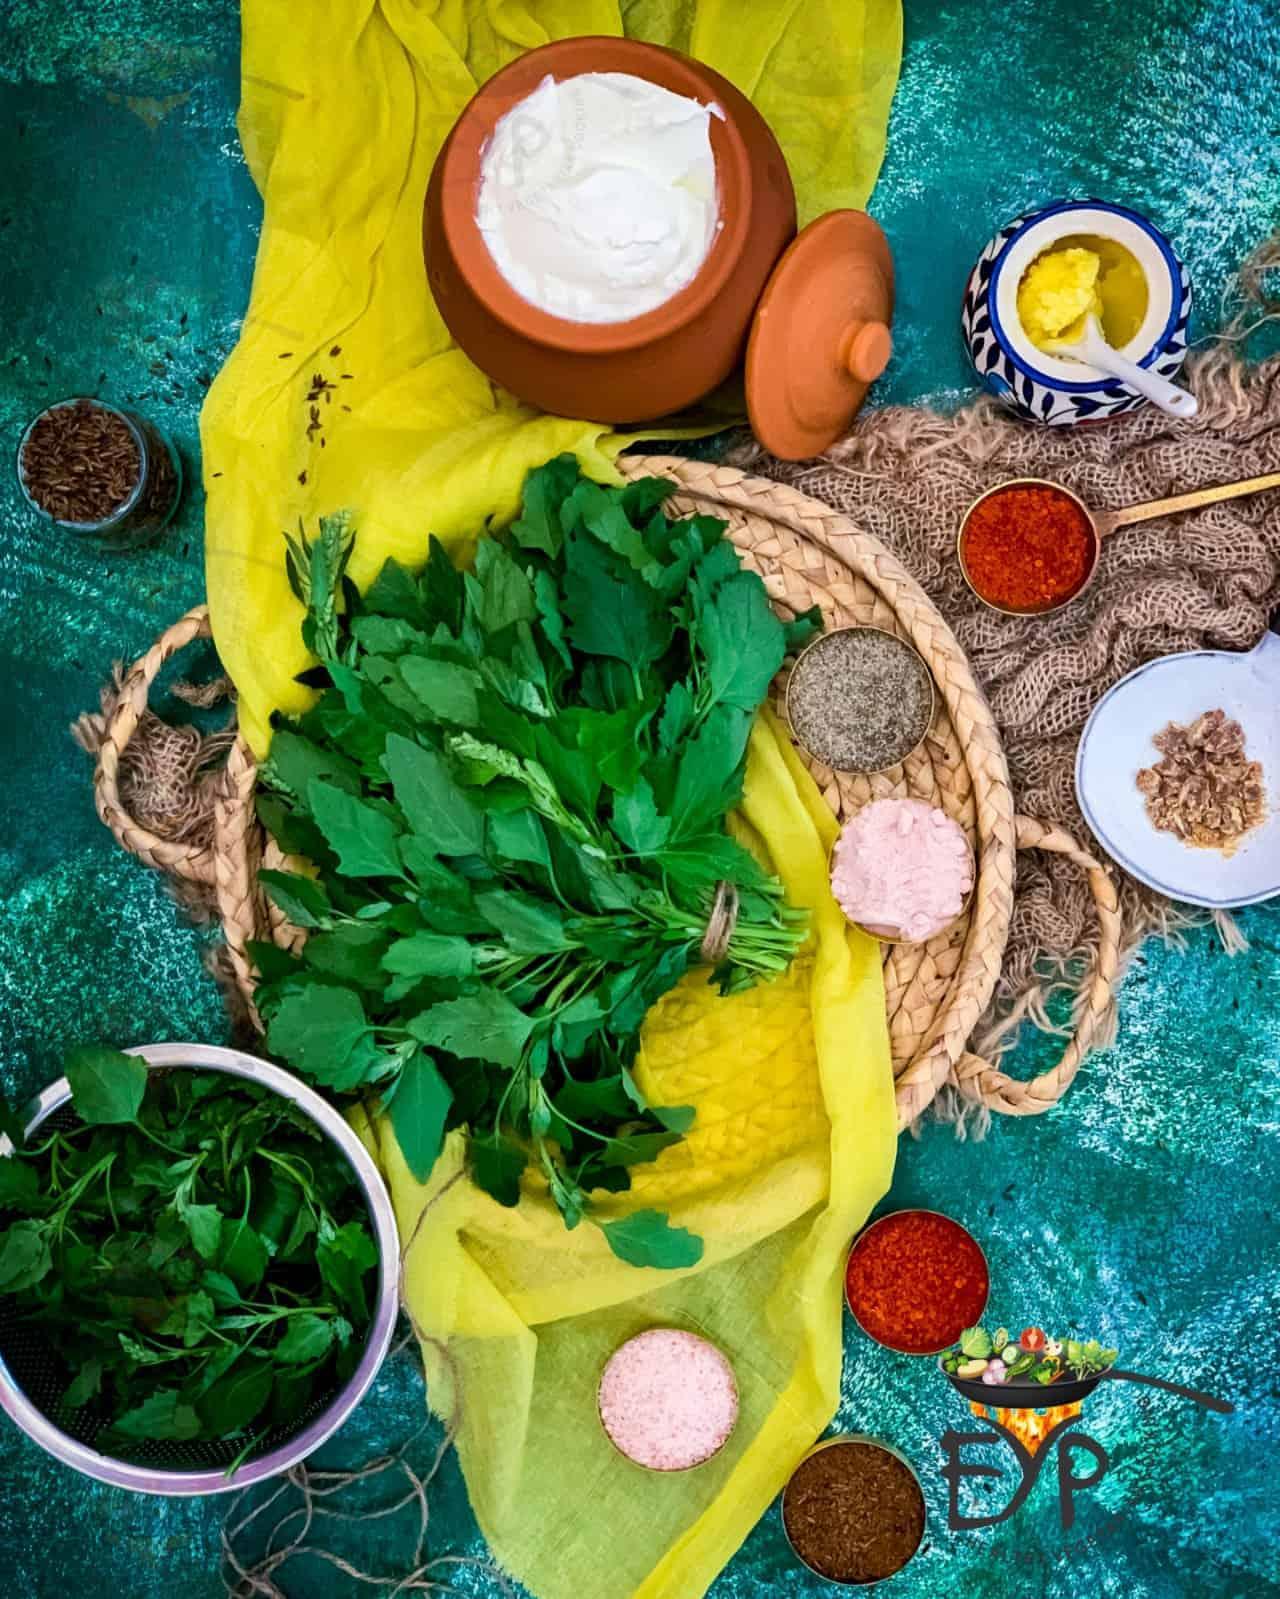 Ingredients for bathua ka raita